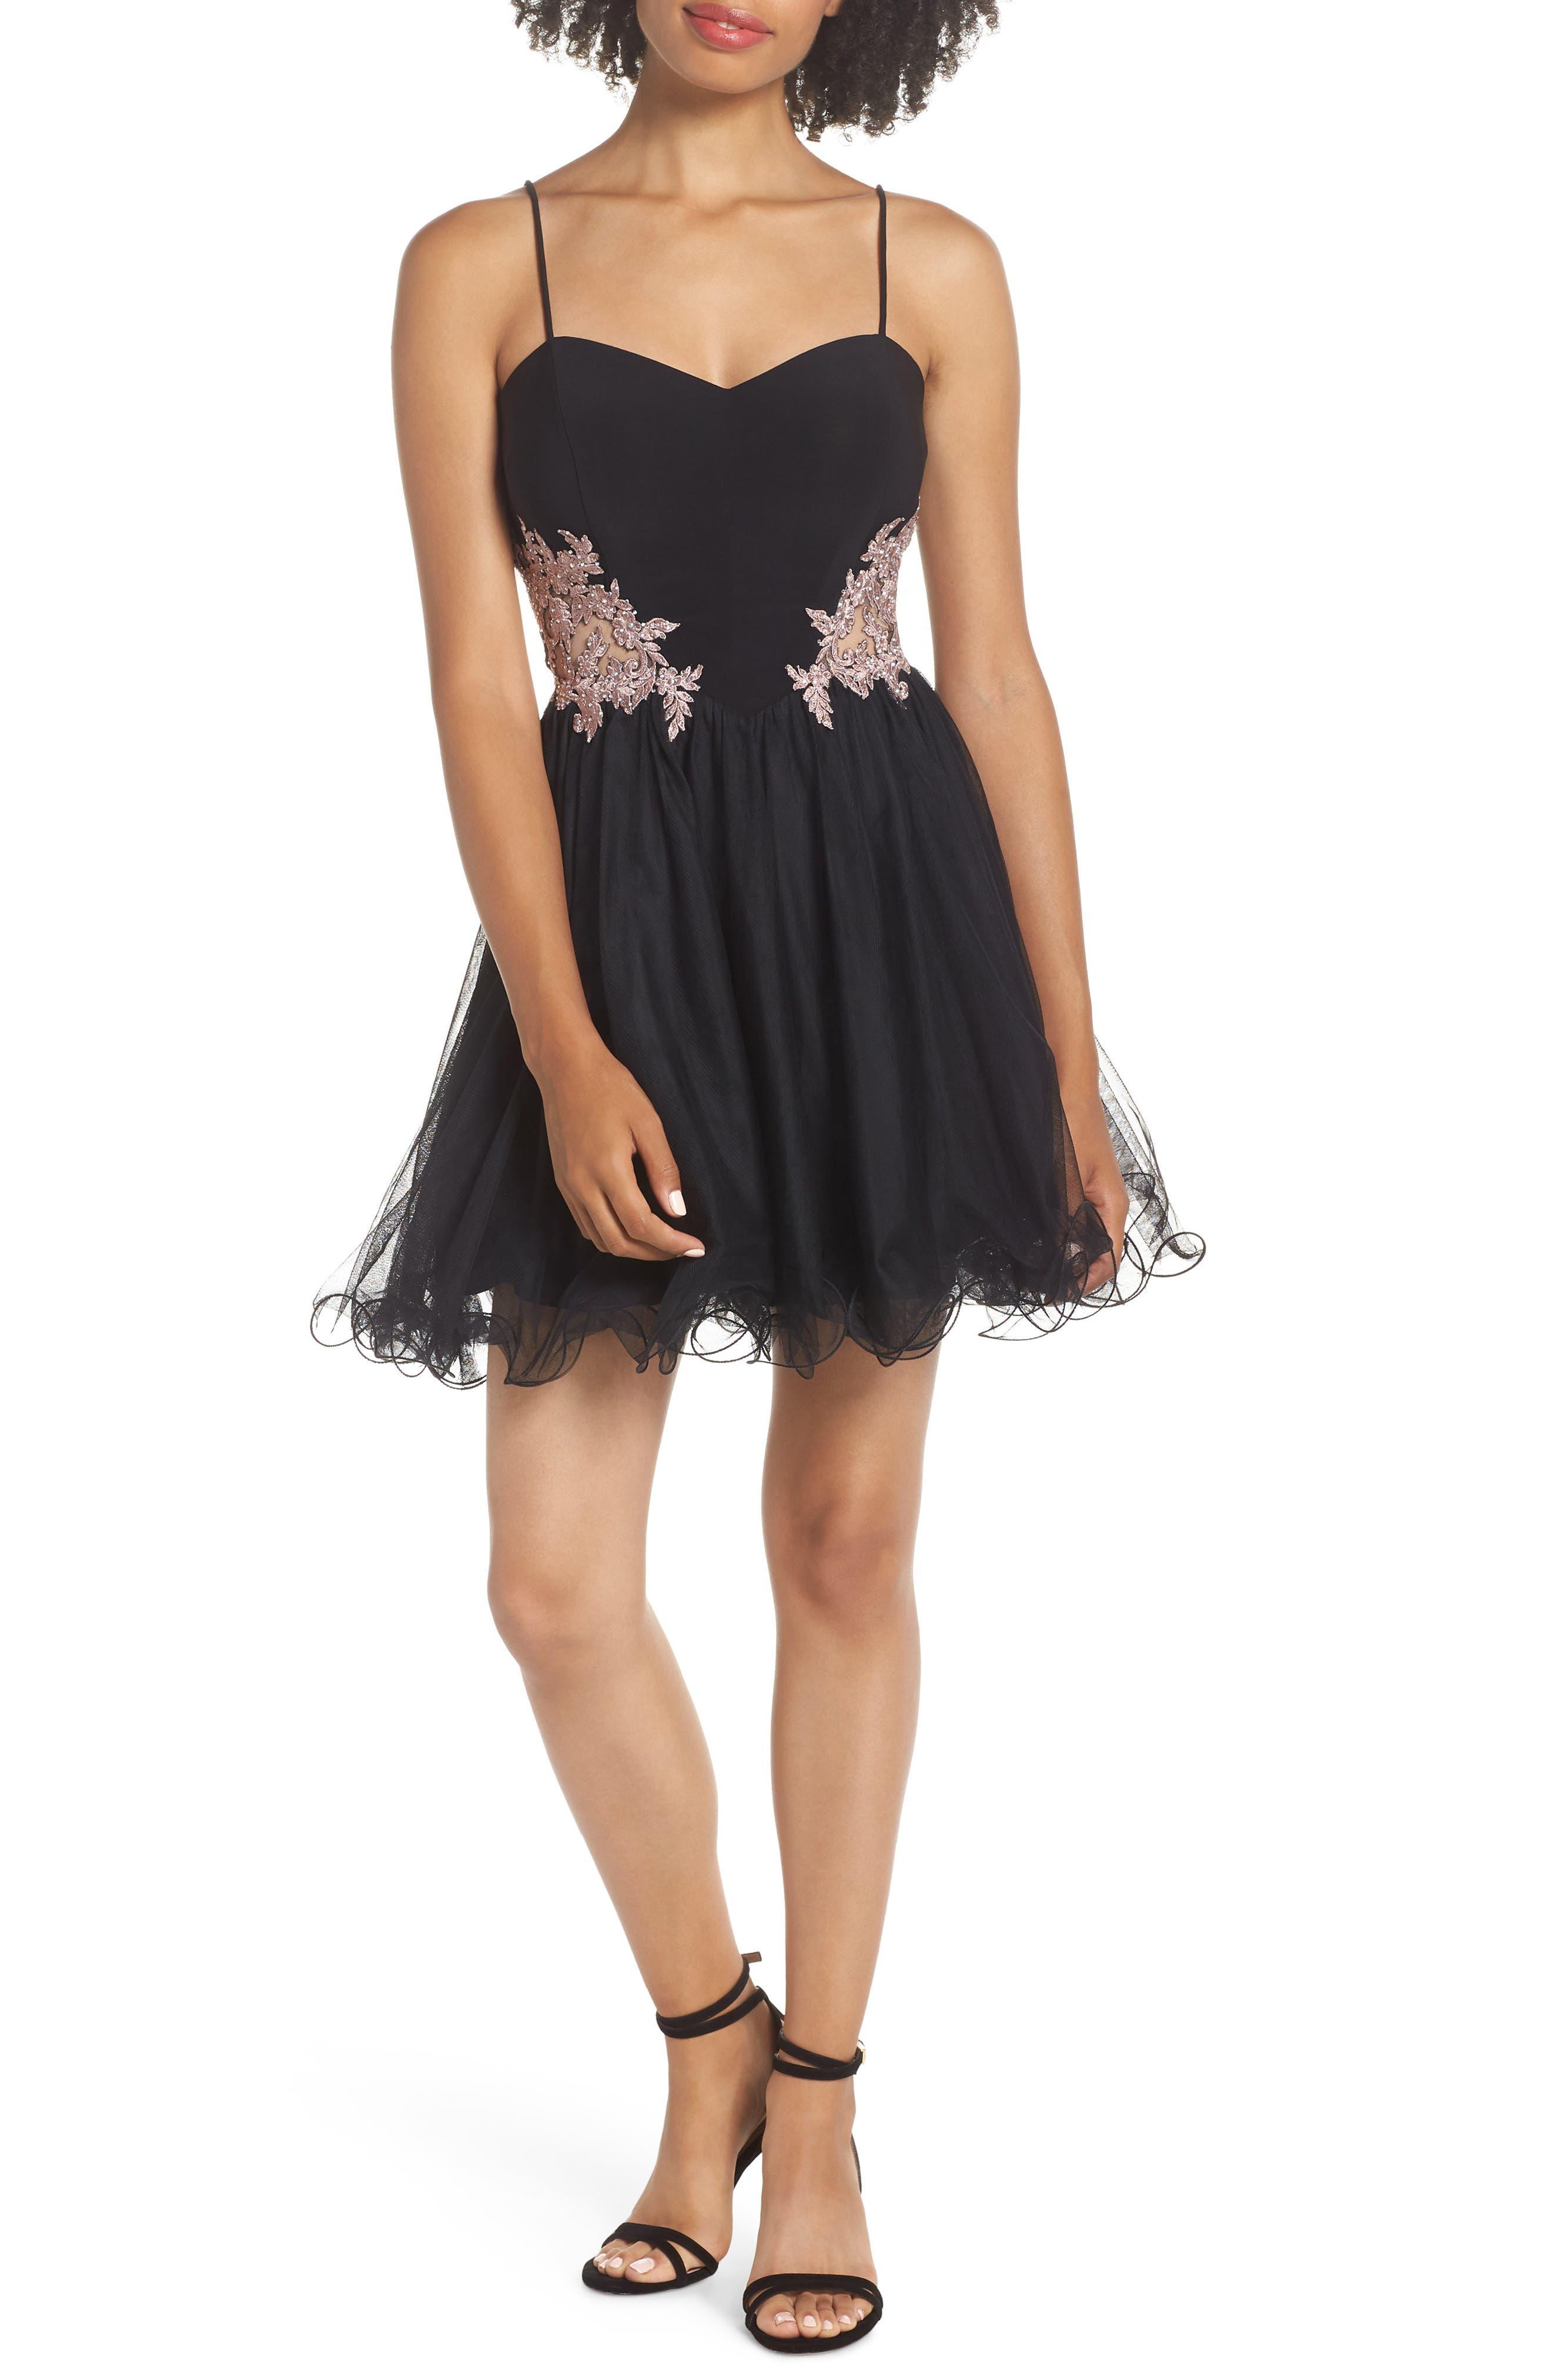 Blondie Nites Applique Sweetheart Fit & Flare Dress, Black